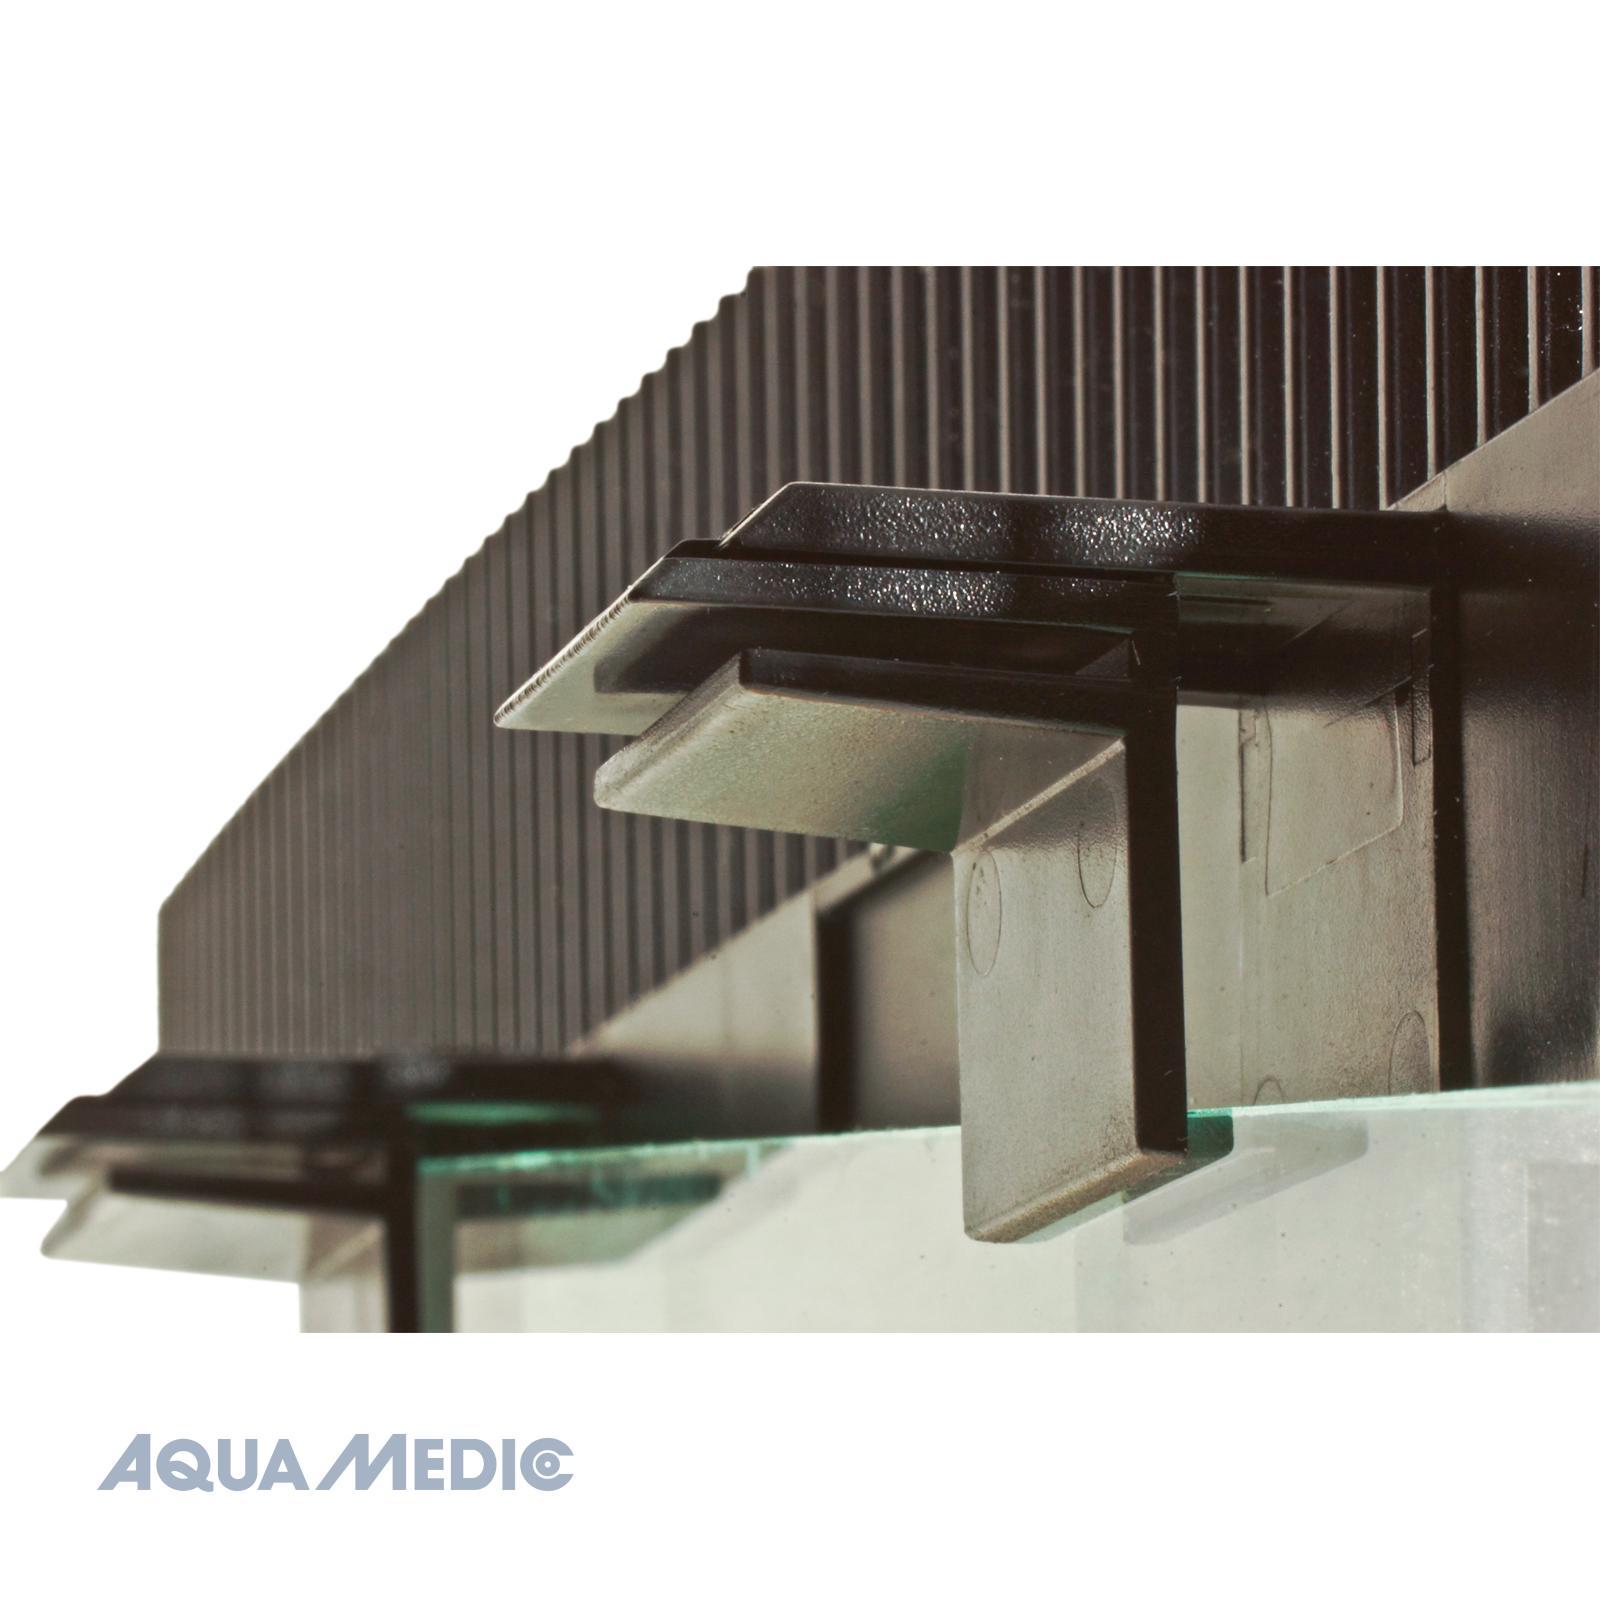 Aqua Medic overflow comb with holder 50 cm